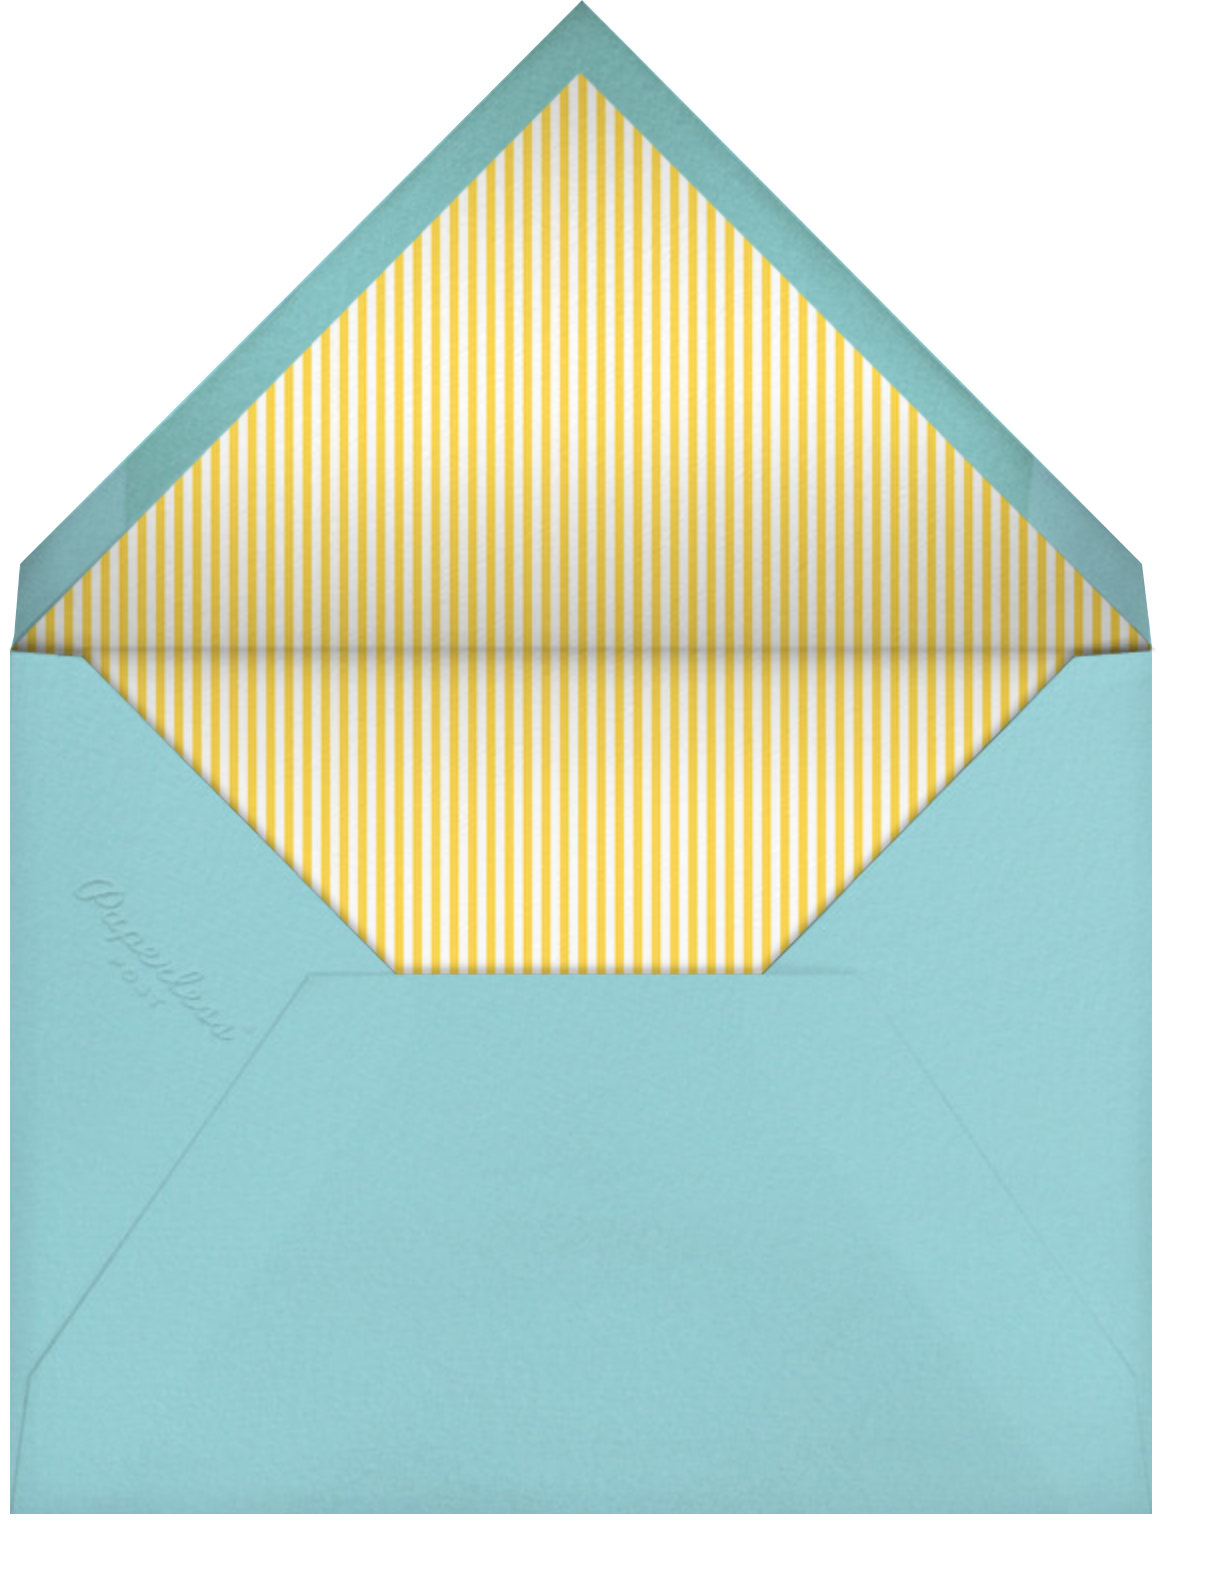 Jungle Birthday Bash (Greeting) - Little Cube - Birthday - envelope back